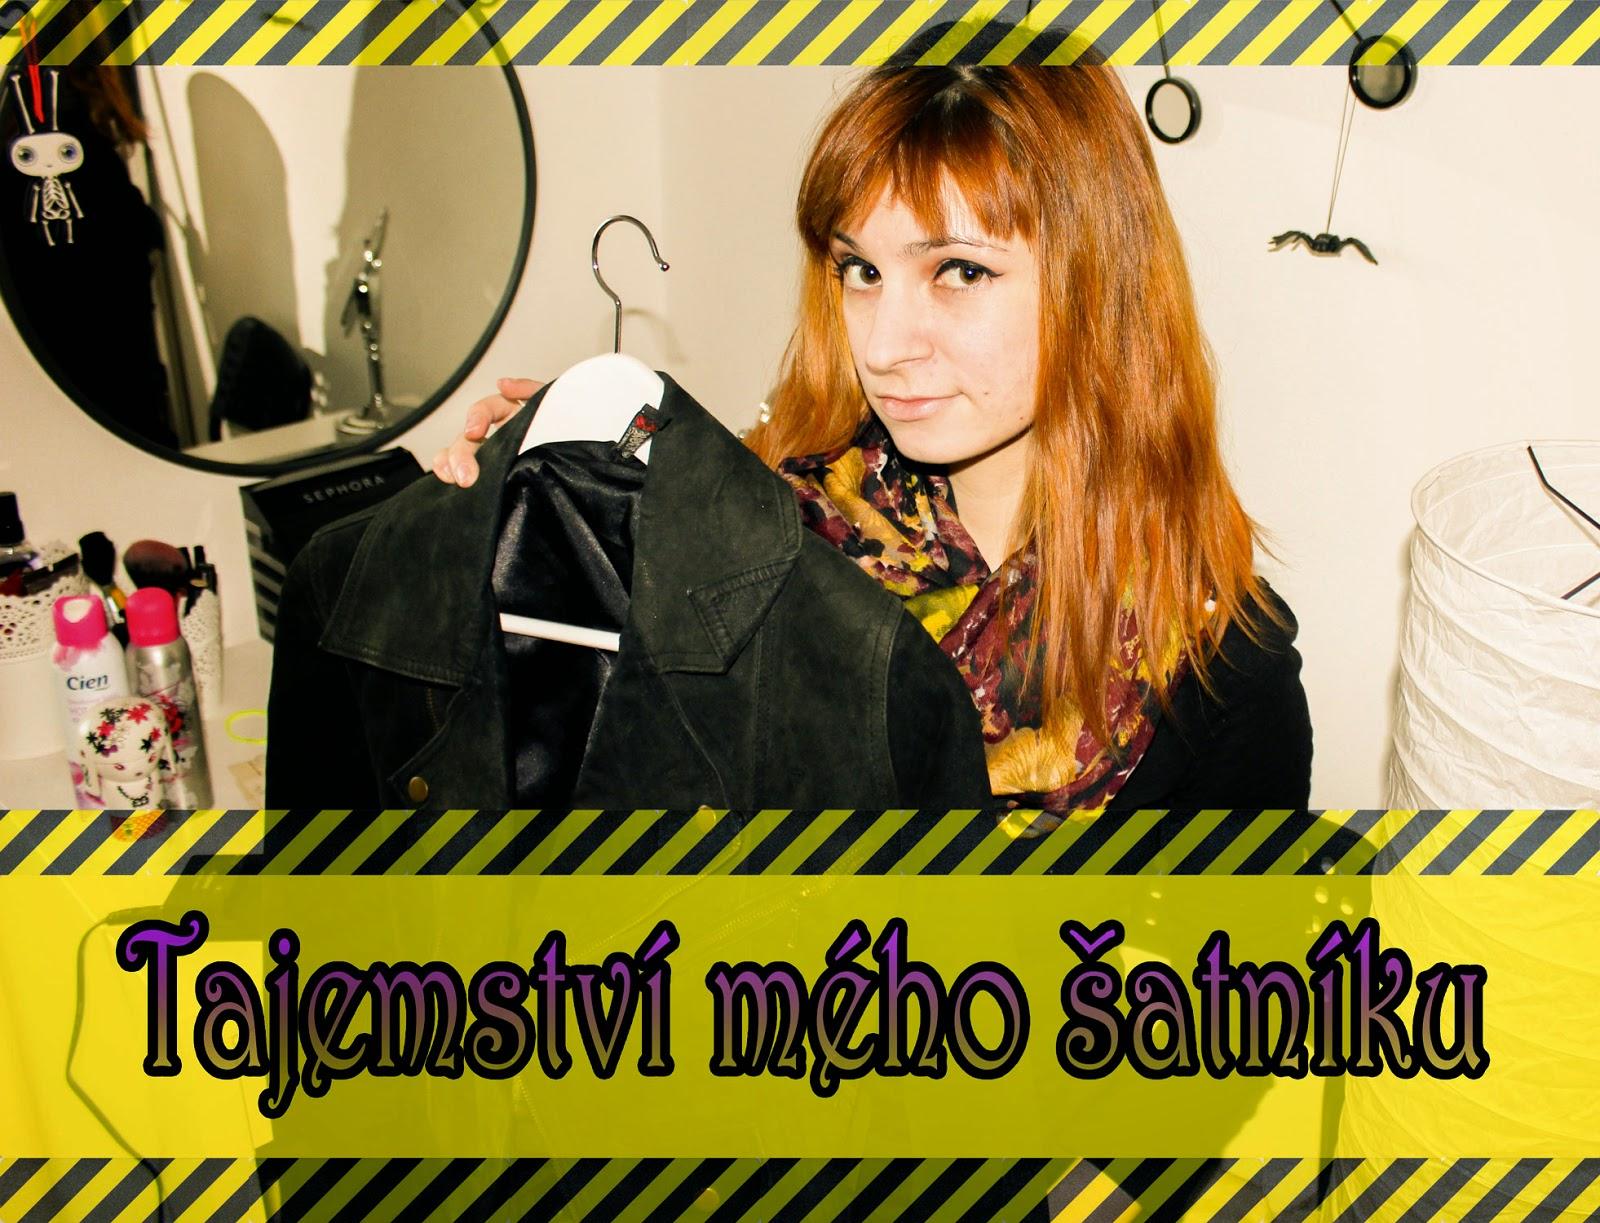 http://youtu.be/DVN6xOvrjsc?list=PL9DWx4HBtHM-OL1o8Xl8ElFSmDd8_qxBT